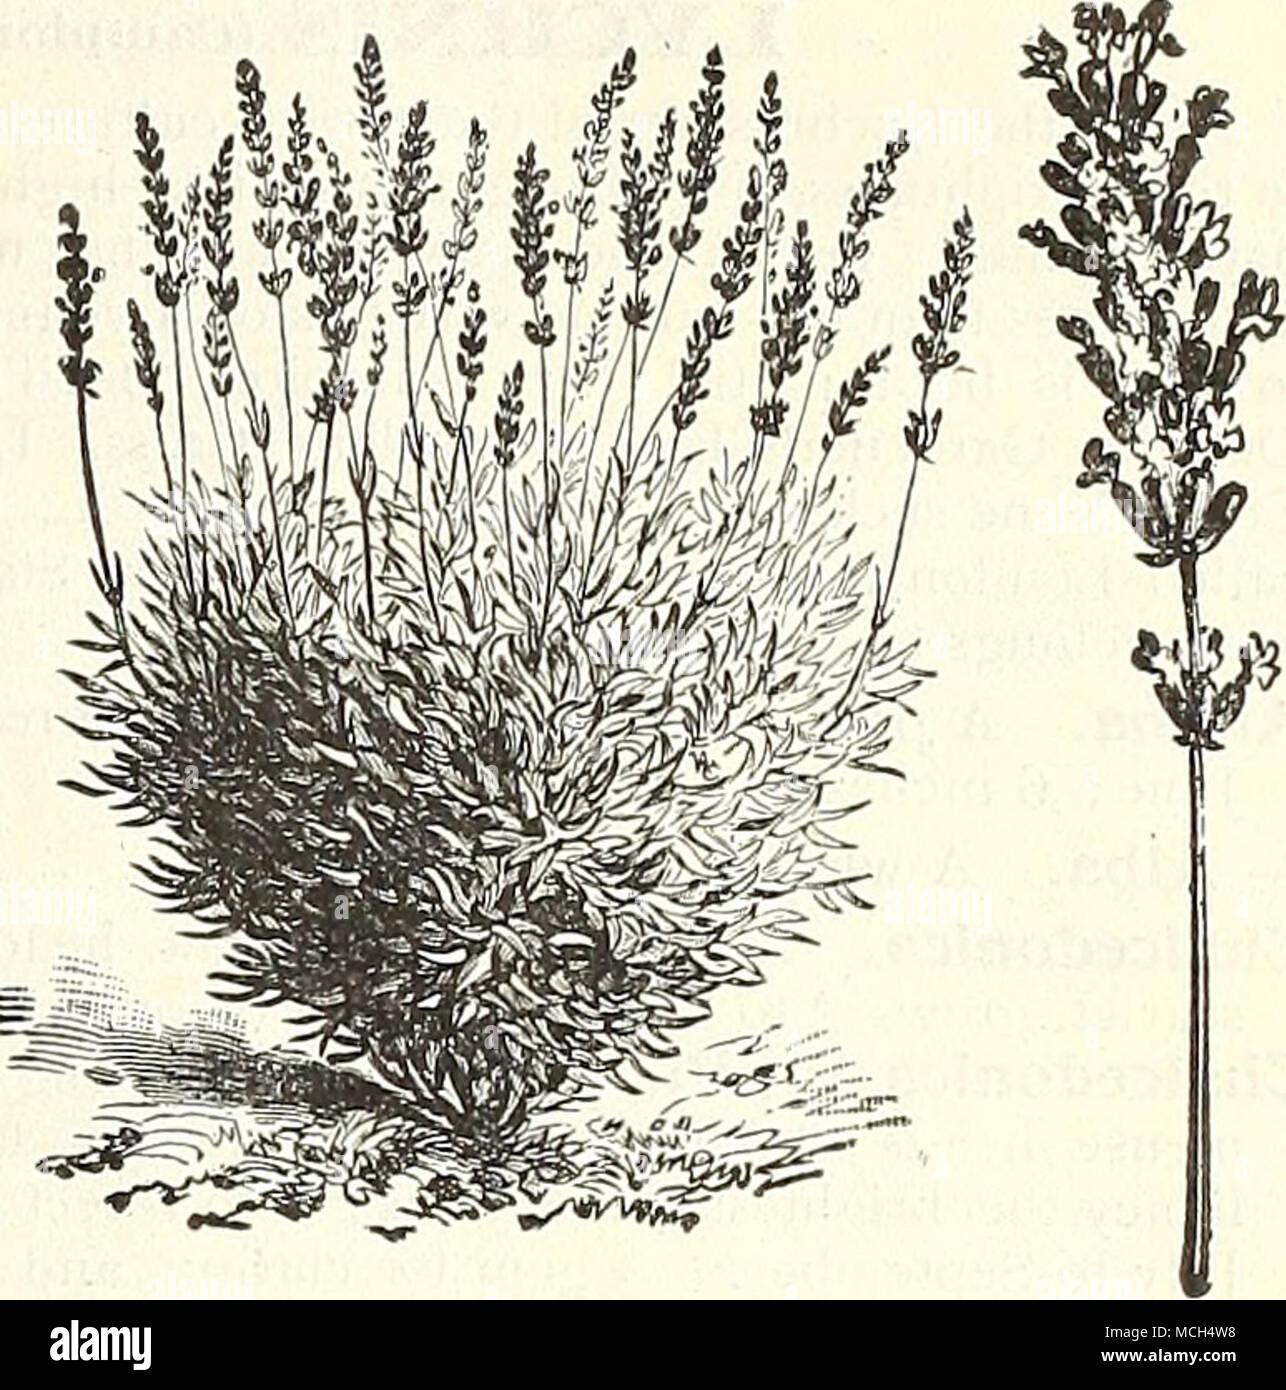 Fiori Di Stagione Settembre lavunder. hthospermum. speciosum rubrum. (groniwell